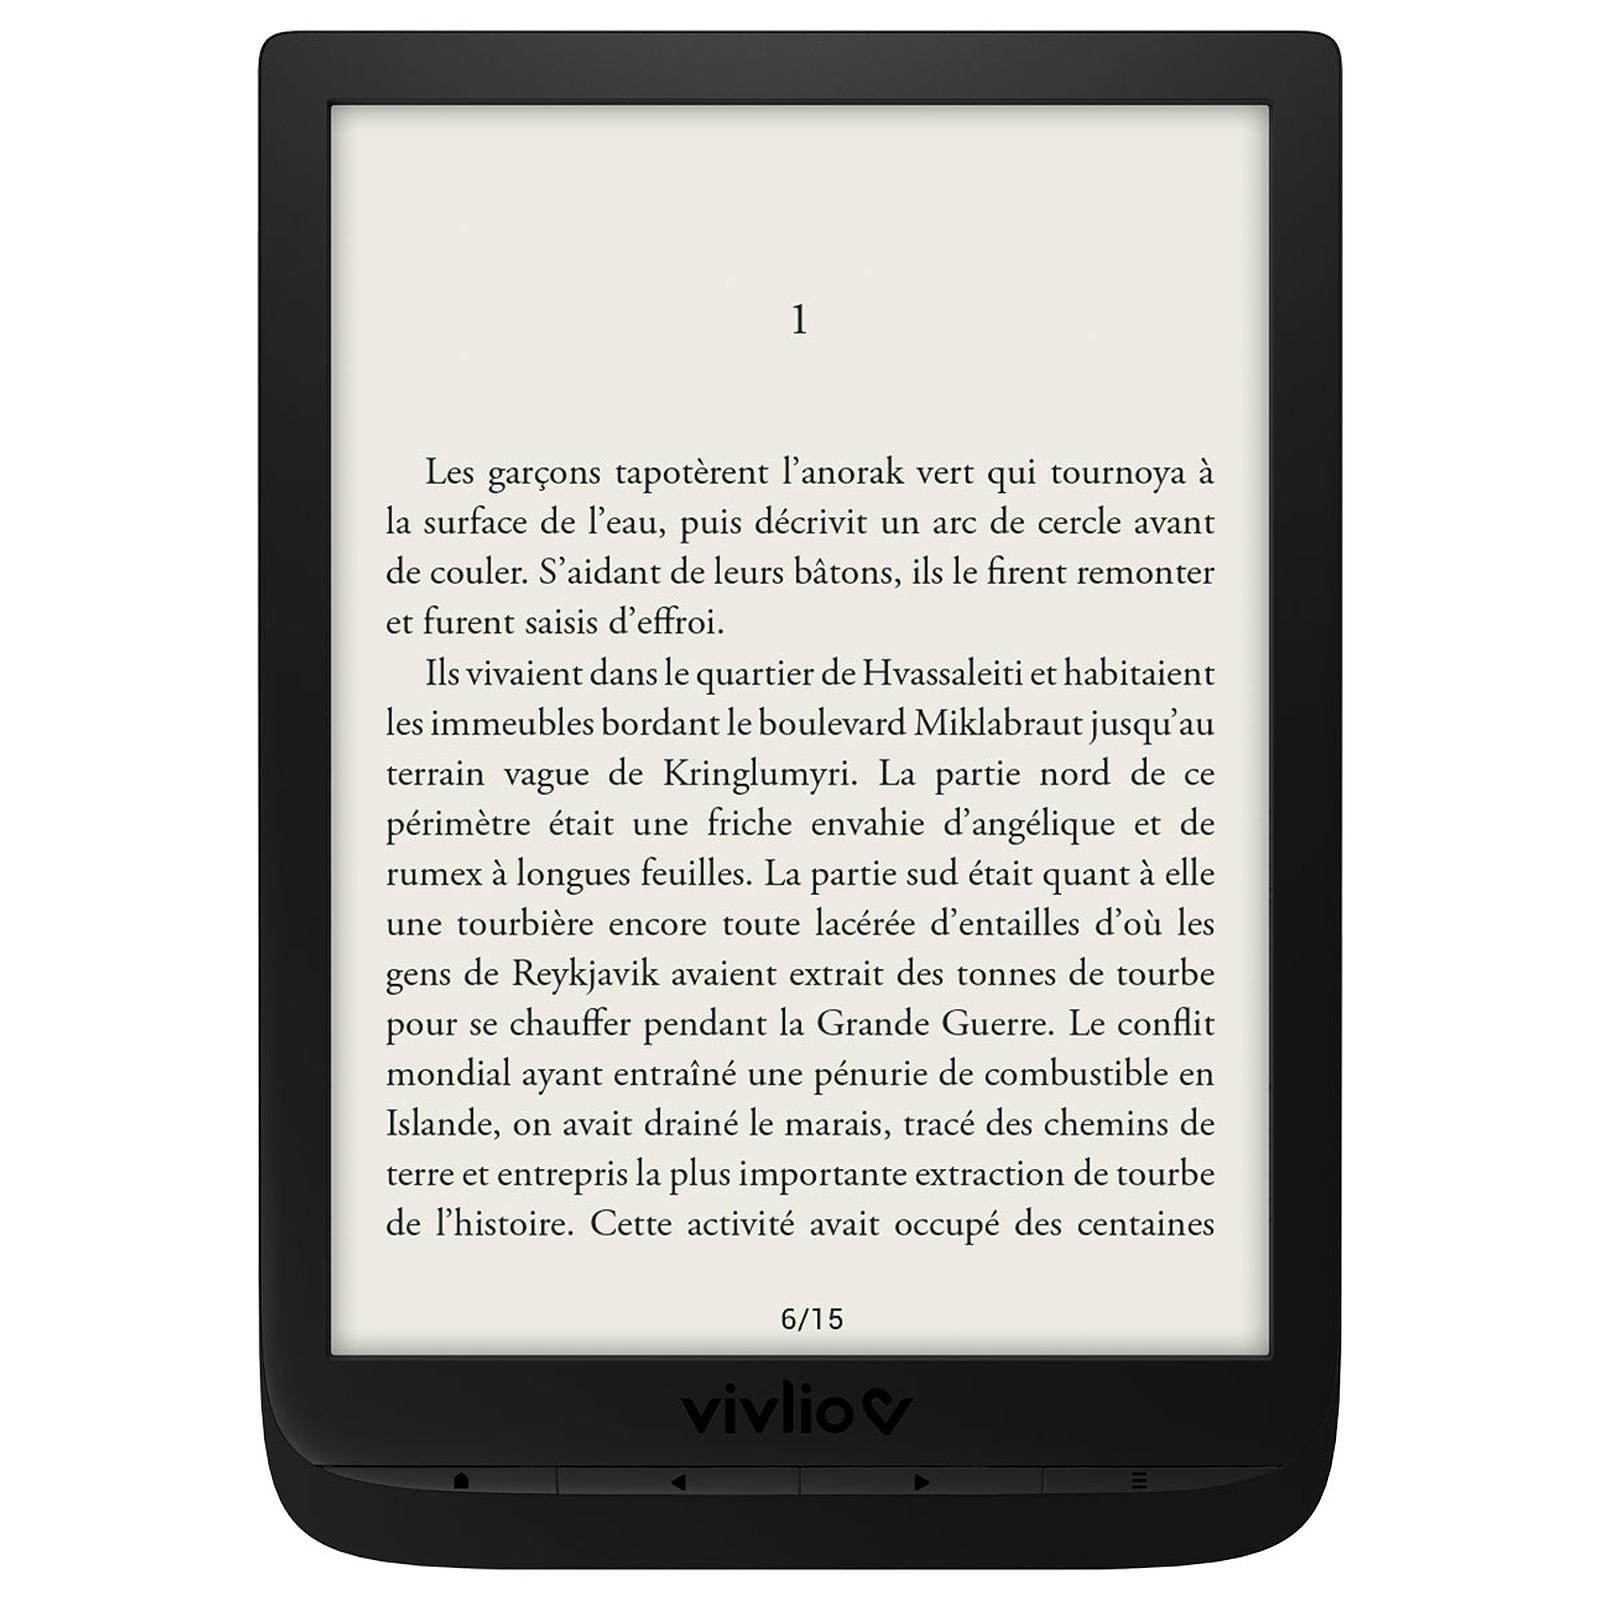 Offert Vivlio Vivlio Inkpad Offert Inkpad Vivlio Inkpad 3Pack 3Pack D'ebooks D'ebooks nOPX0k8w